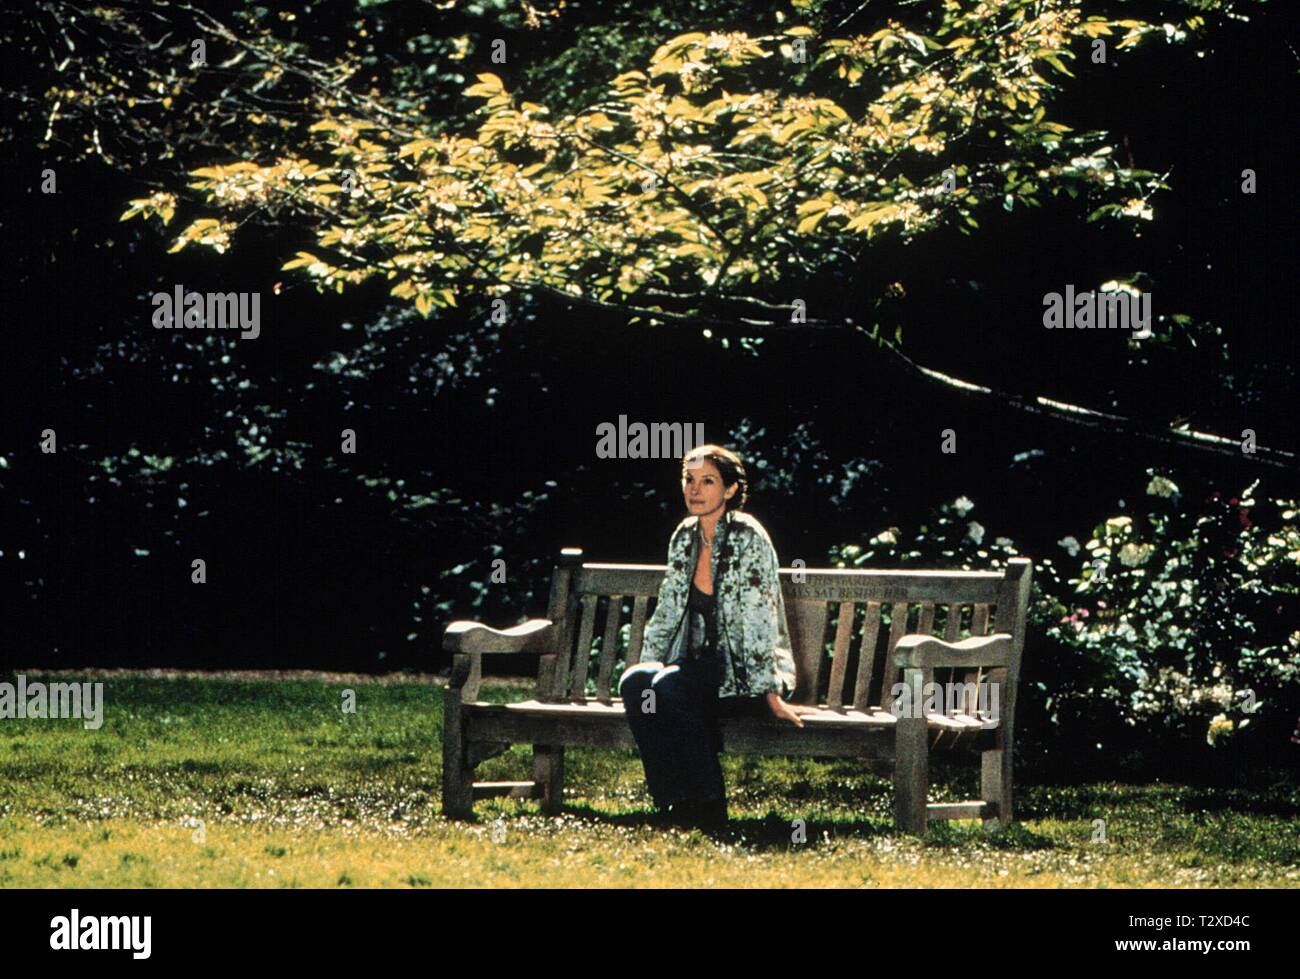 JULIA ROBERTS, NOTTING HILL, 1999 - Stock Image